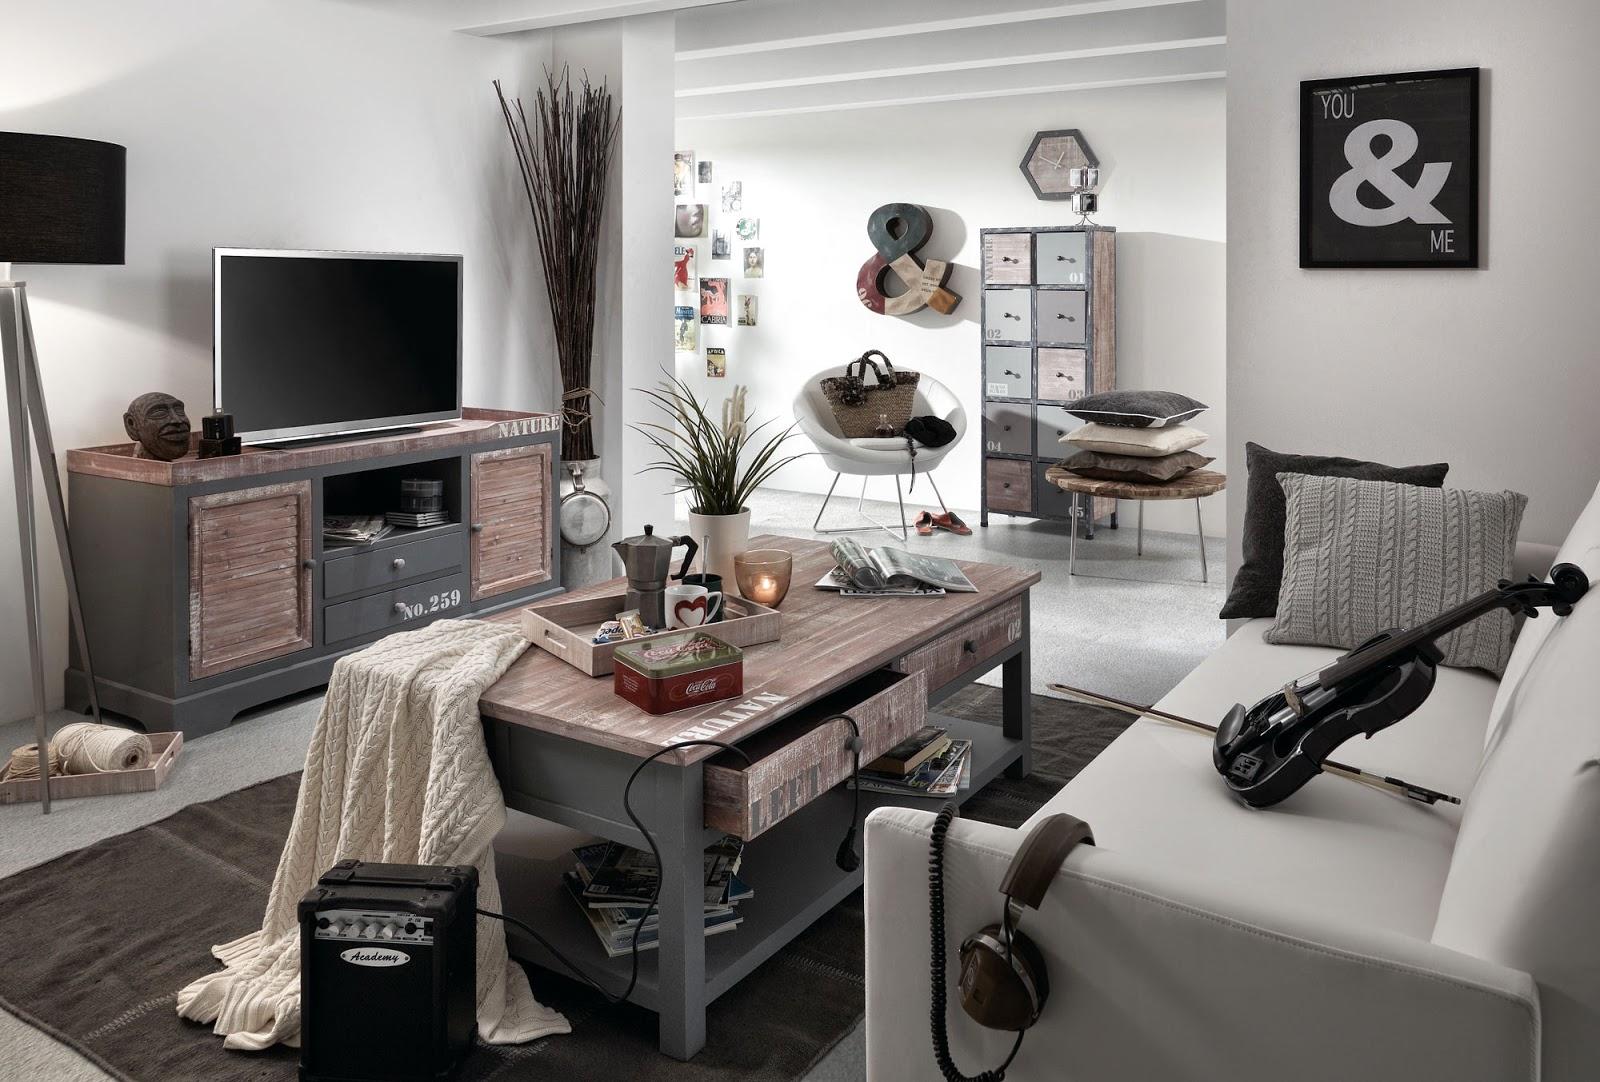 http://www.portobellostreet.es/mueble/38379/Salon-industrial-Vintage-Erutna-II